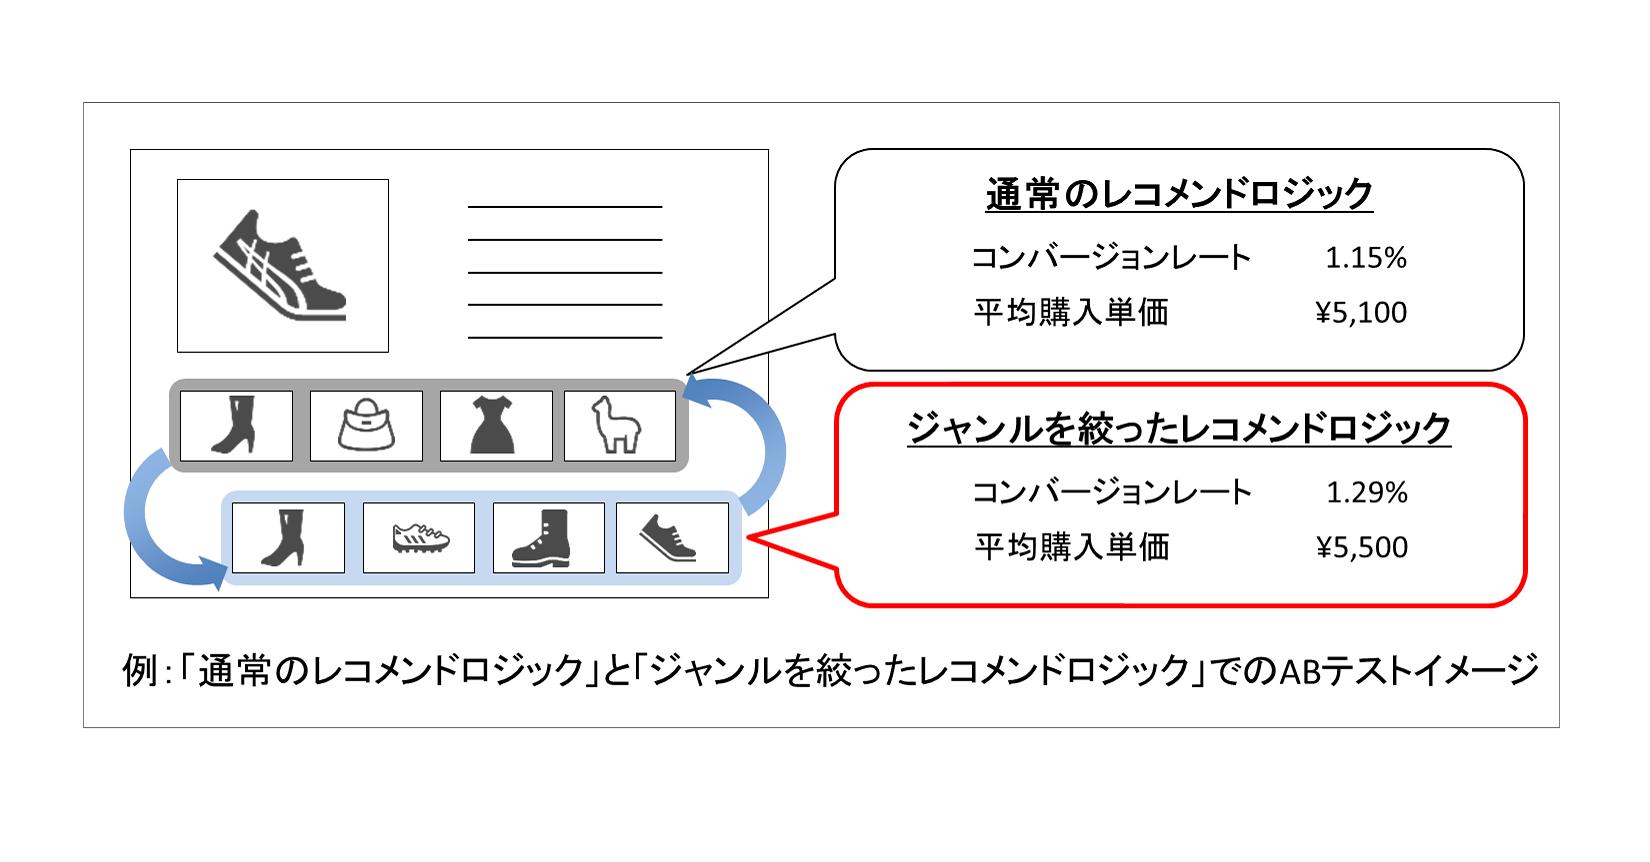 http://www.veritrans.co.jp/info/uploads/ABtes_1.png